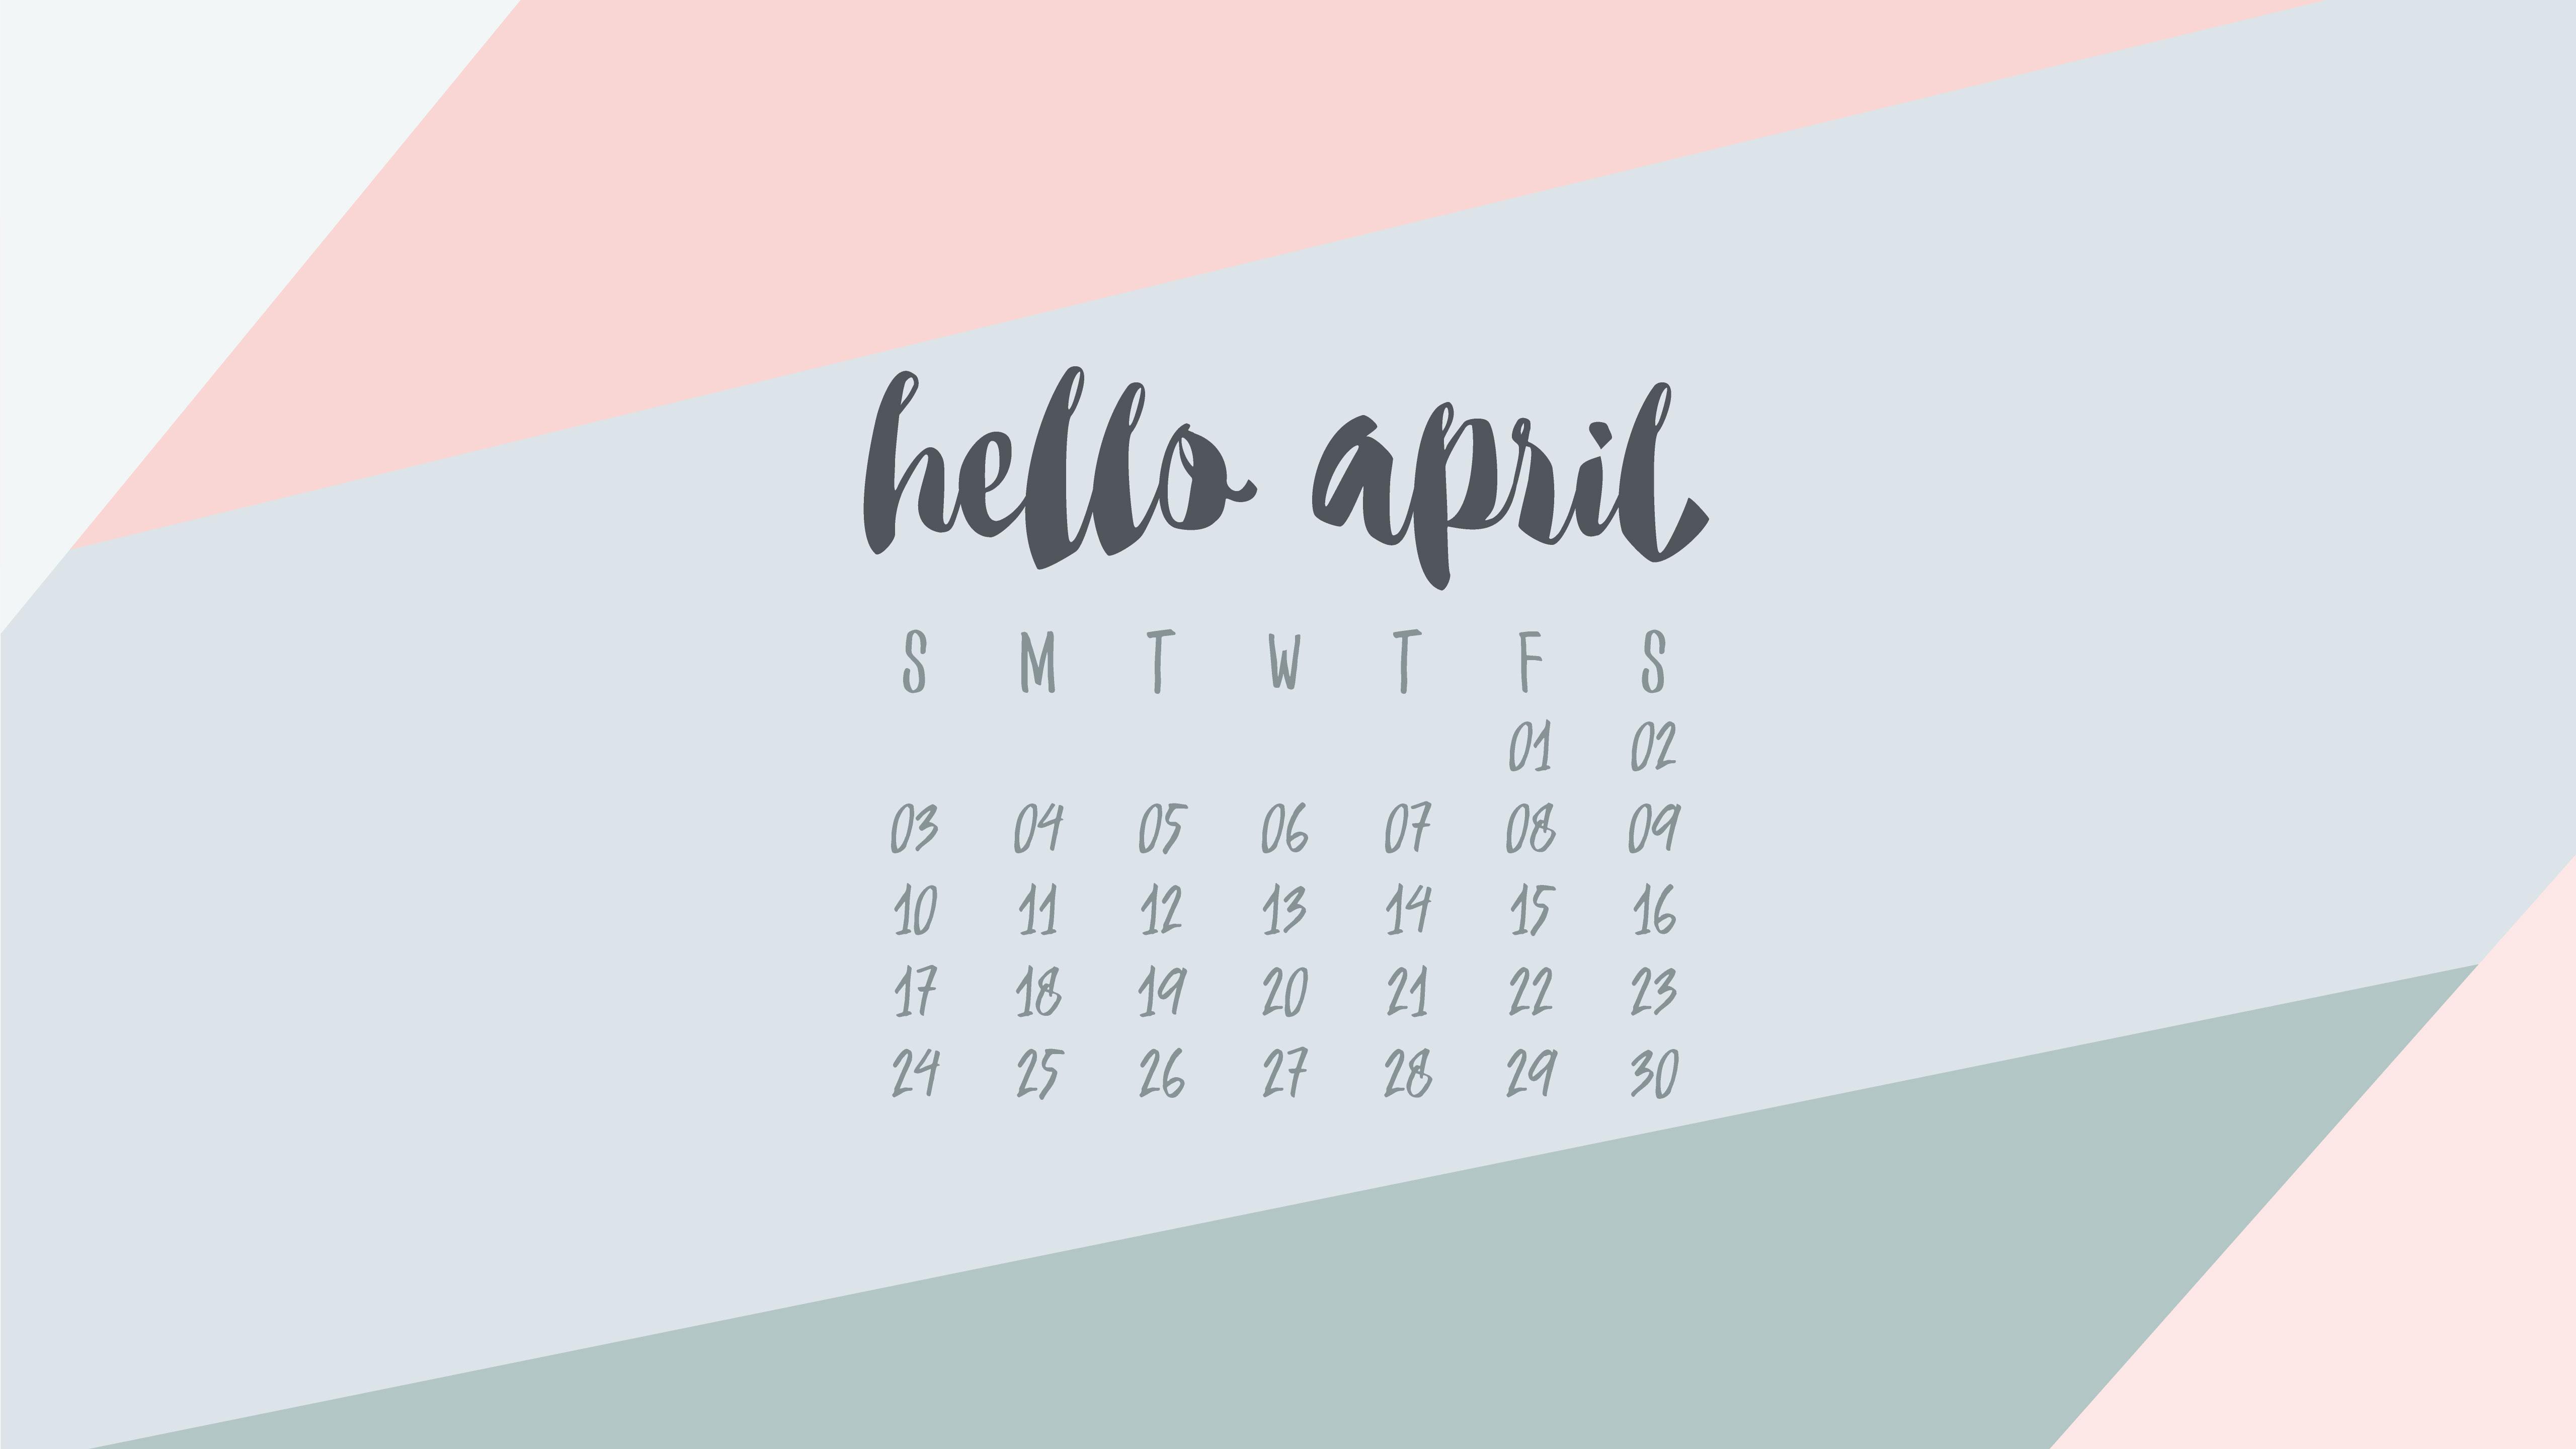 April 2016 Desktop Calendar Wallpaper UpperCase Designs 5120x2880